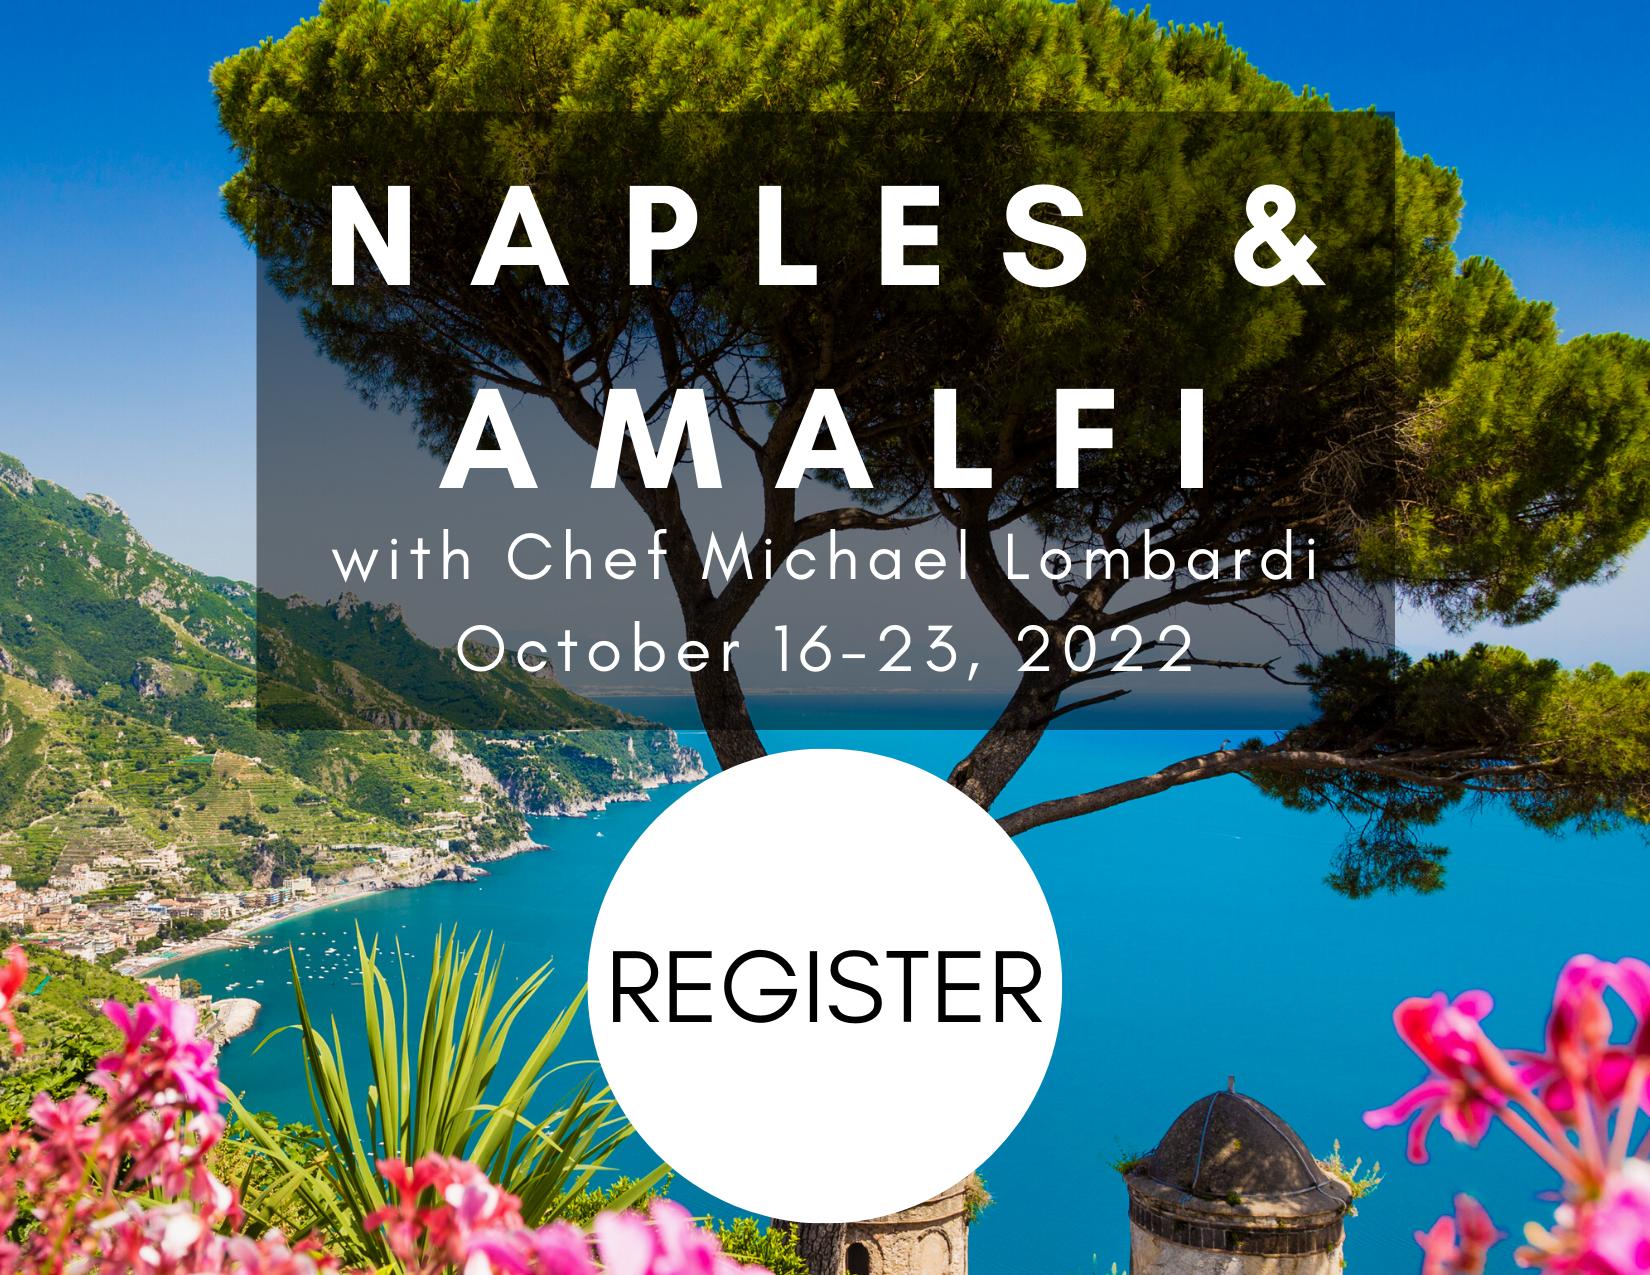 Naples_Amalfi_Register.png